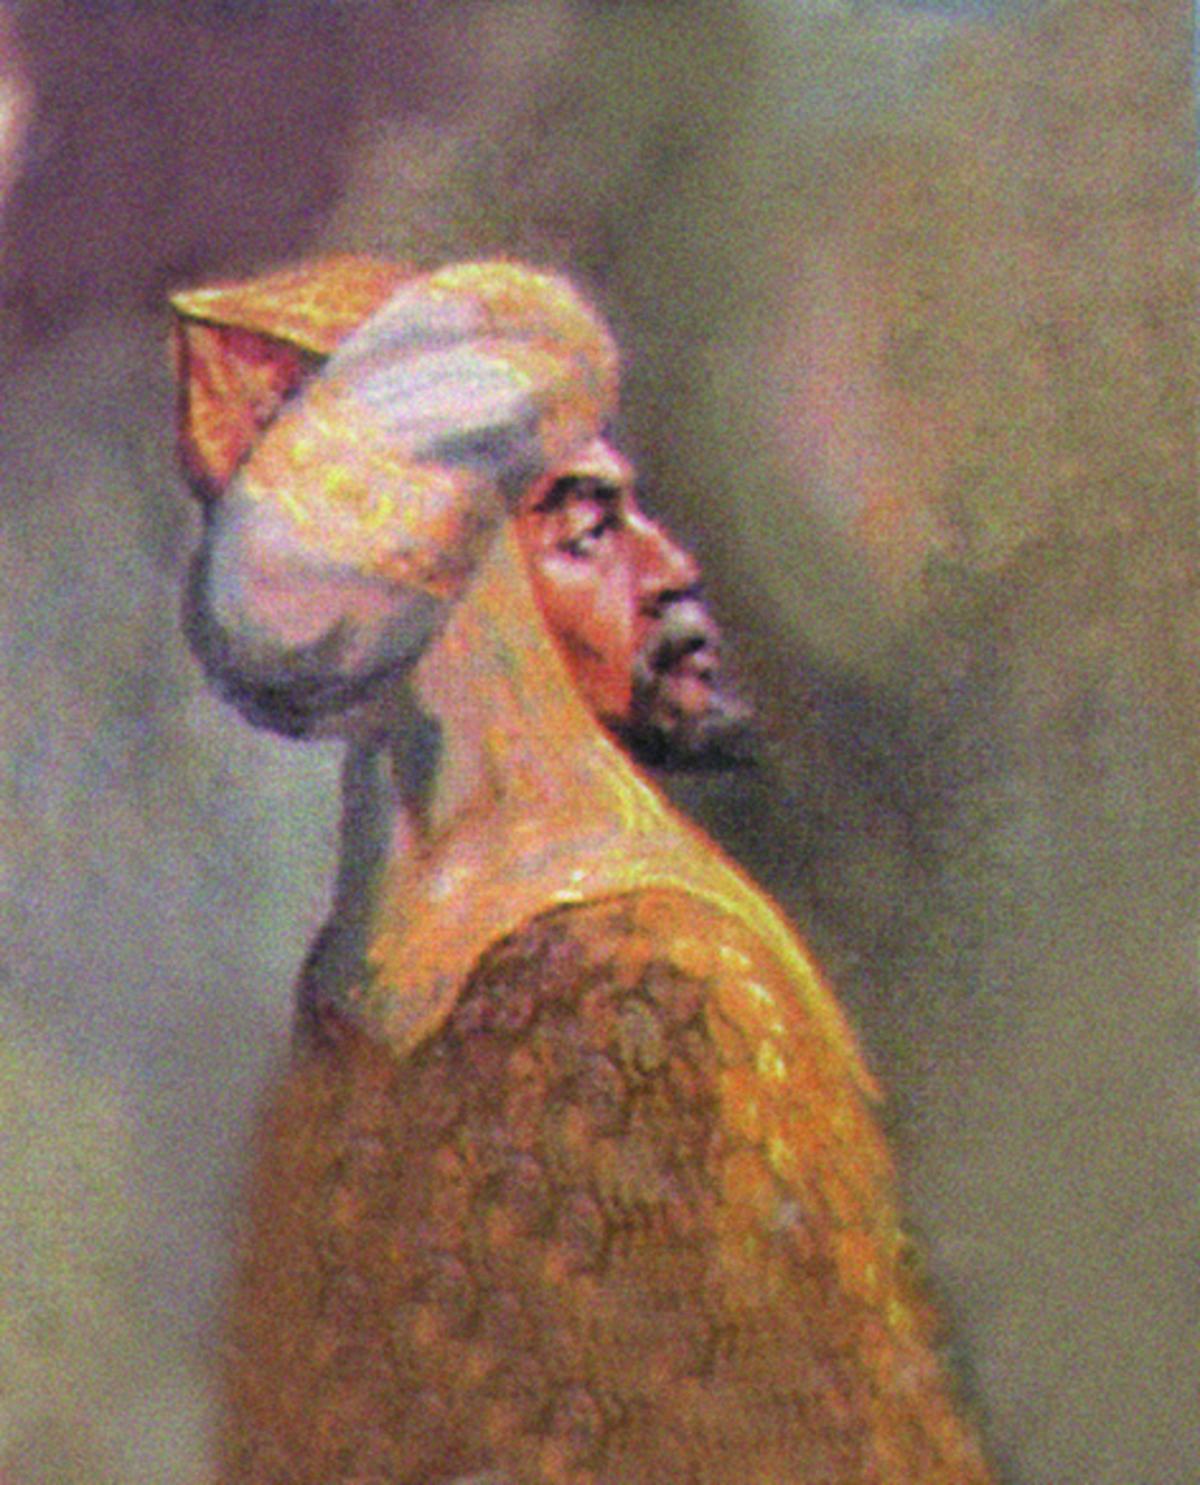 Керей хан казакша реферат 6472